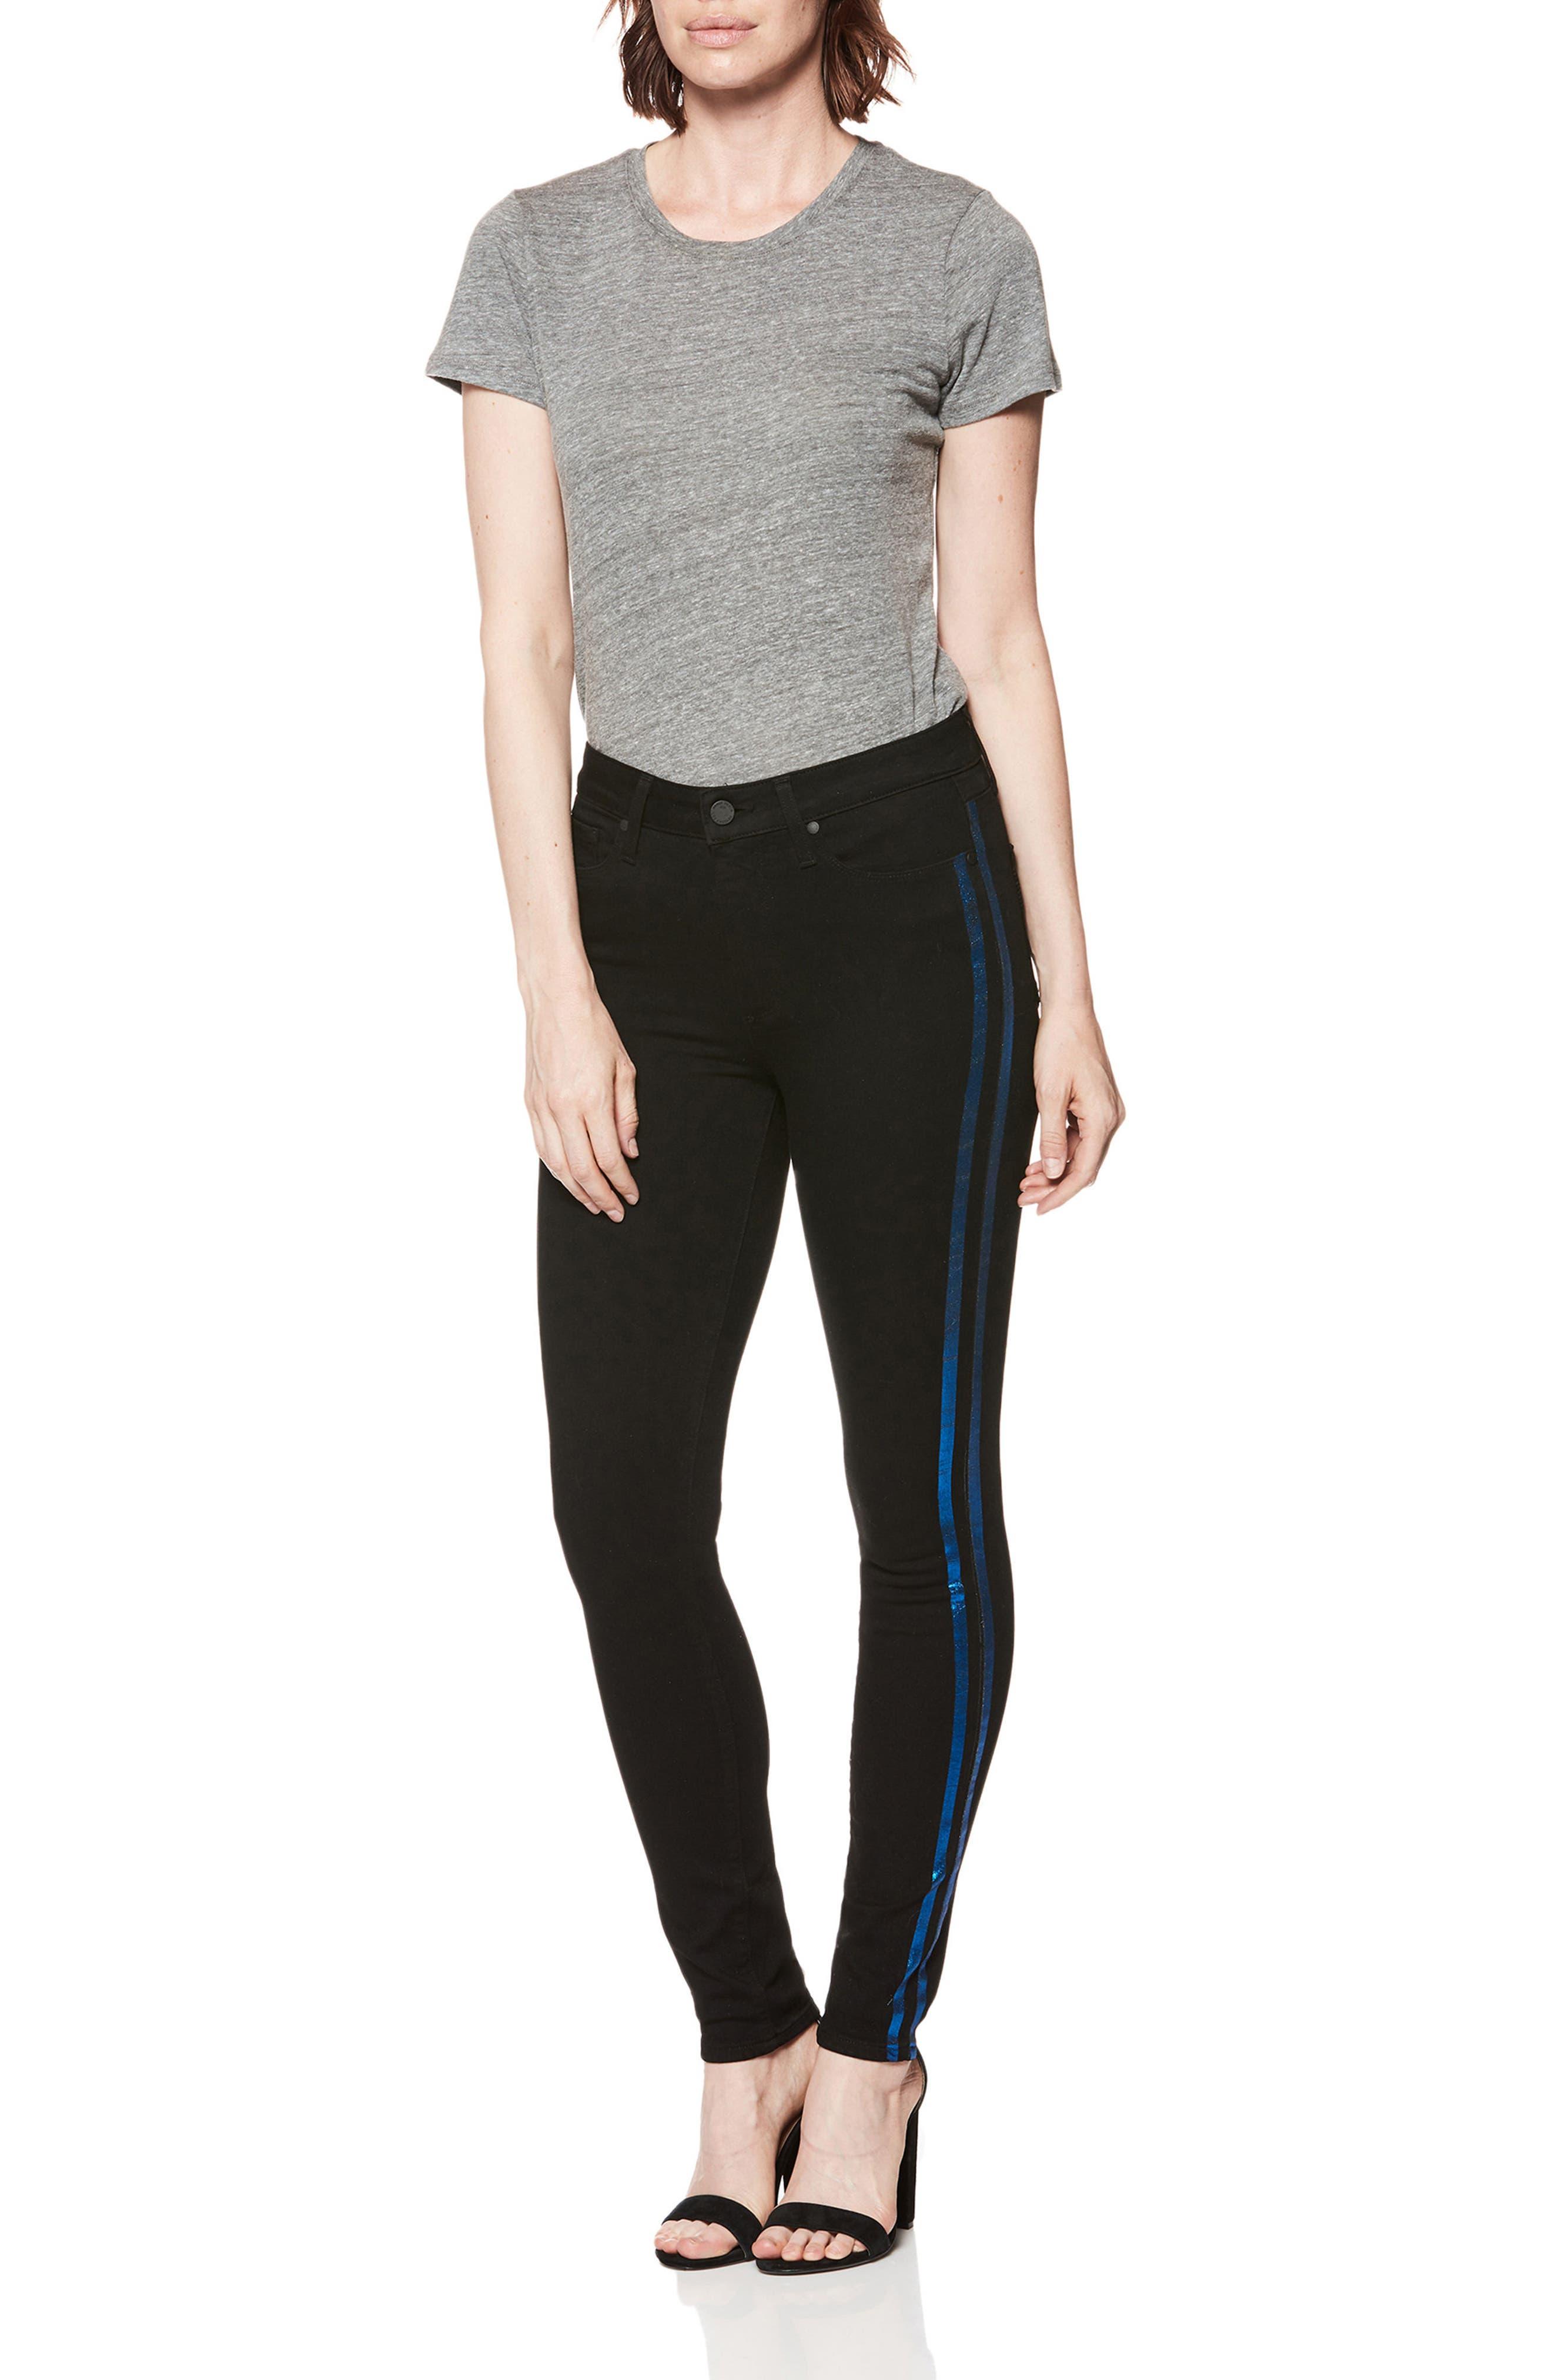 Transcend - Hoxton High Waist Ultra Skinny Jeans,                             Alternate thumbnail 3, color,                             BLACK SHADOW W/ BLUE